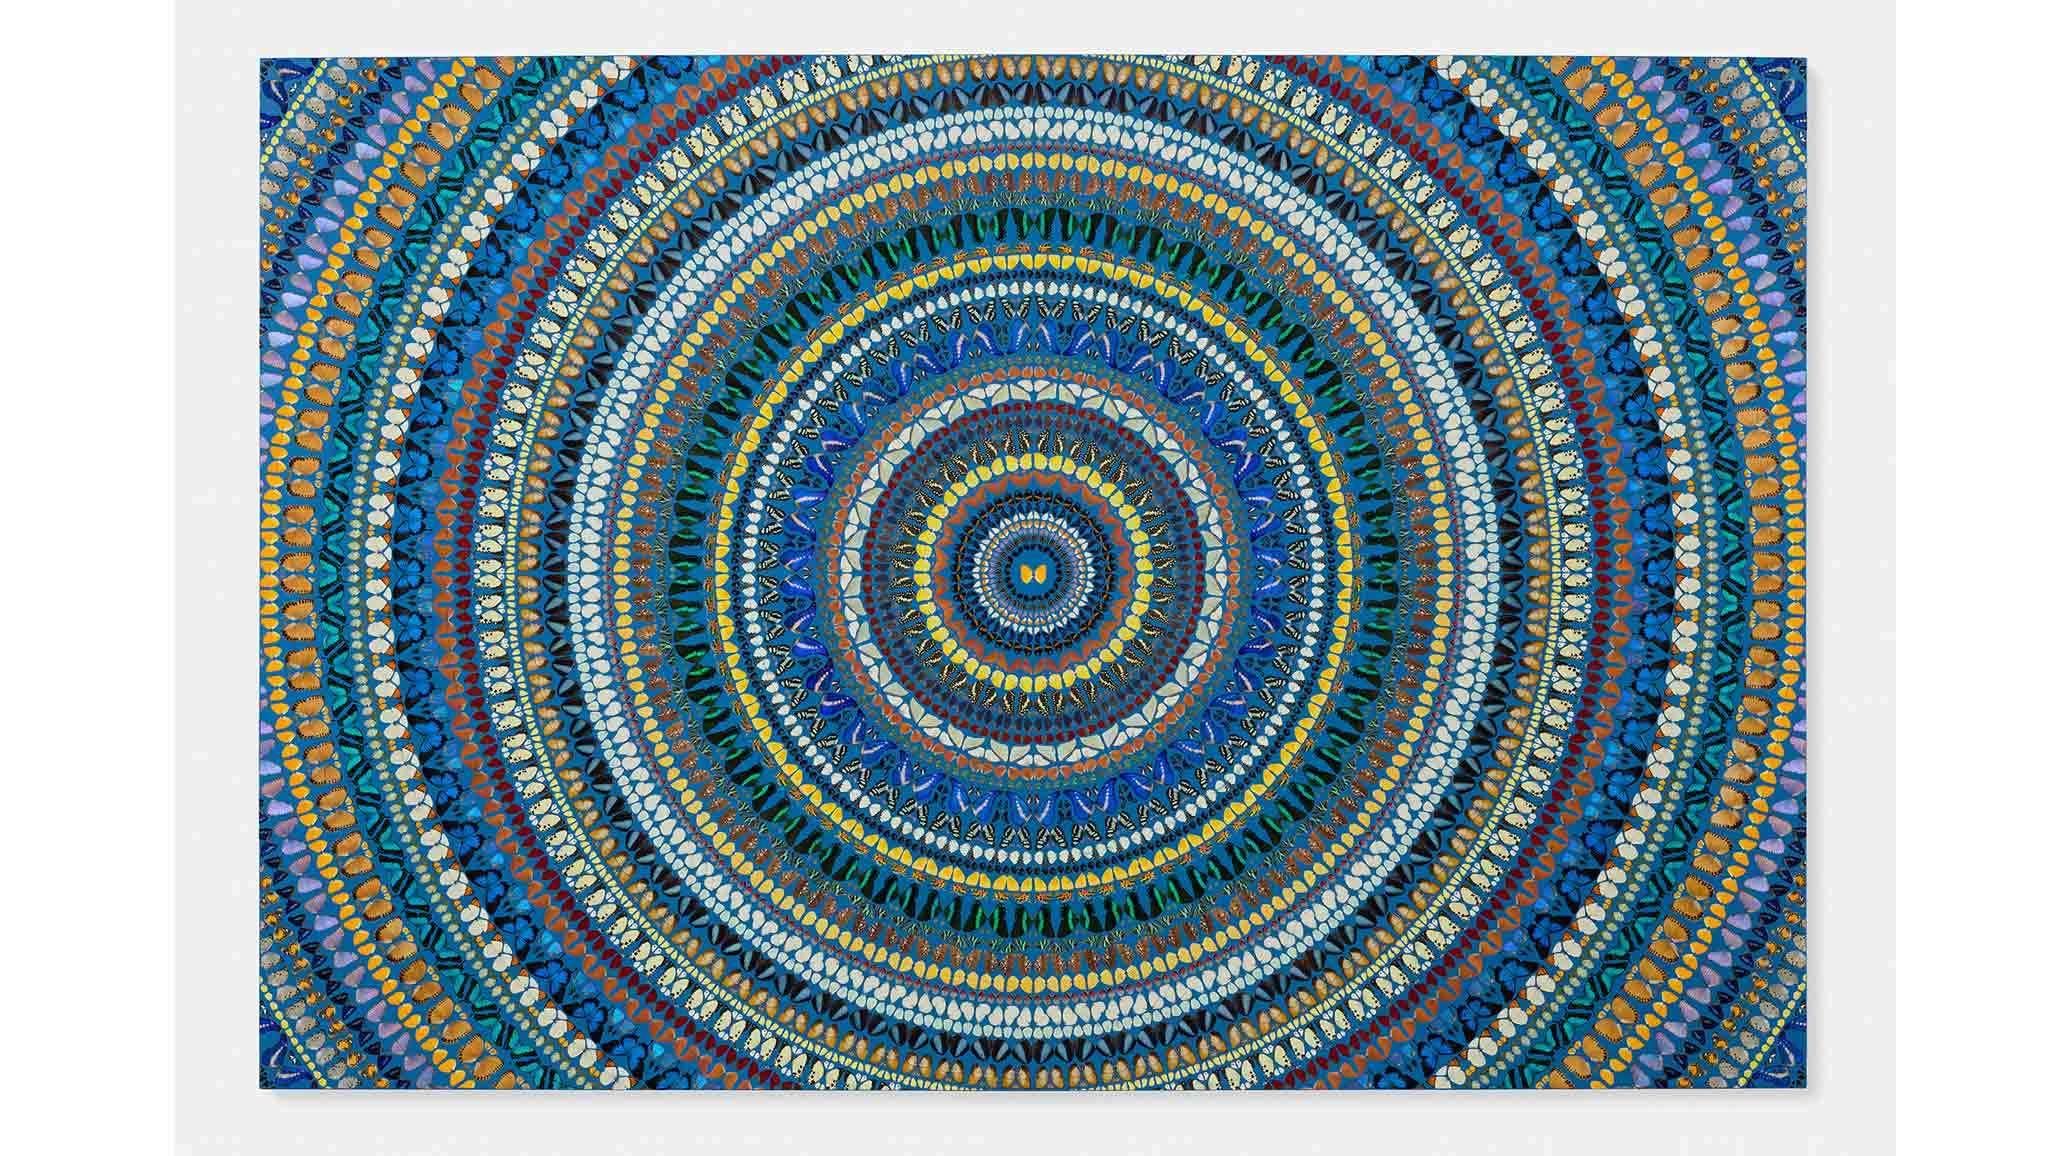 Damien Hirst: Mandalas